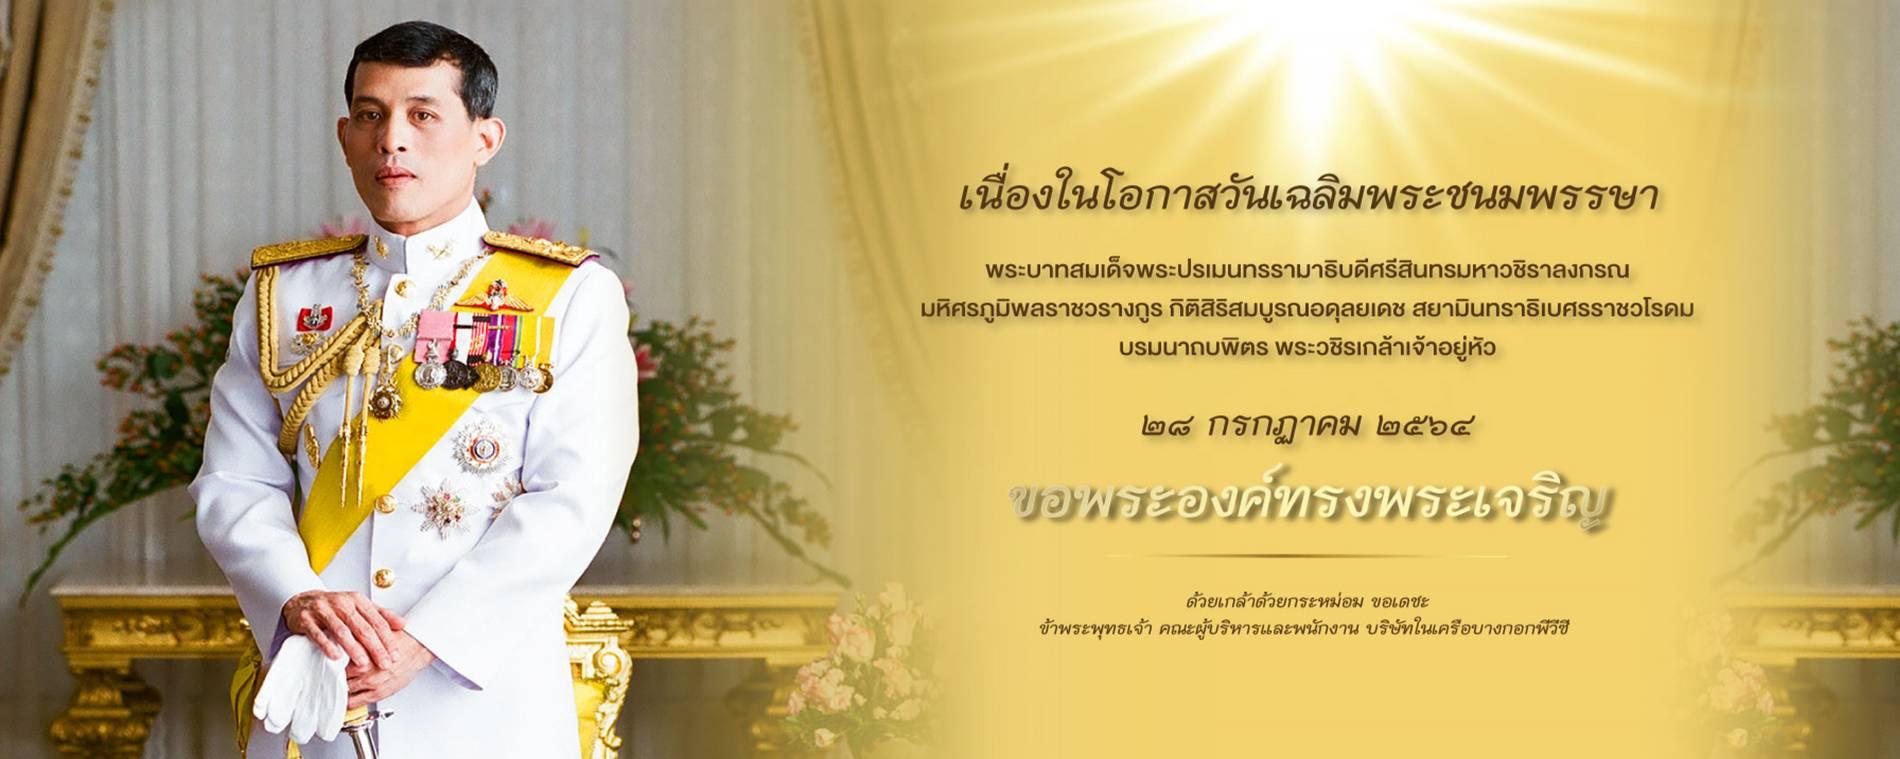 https://bangkokpvc-online.com/clearance-sale.html